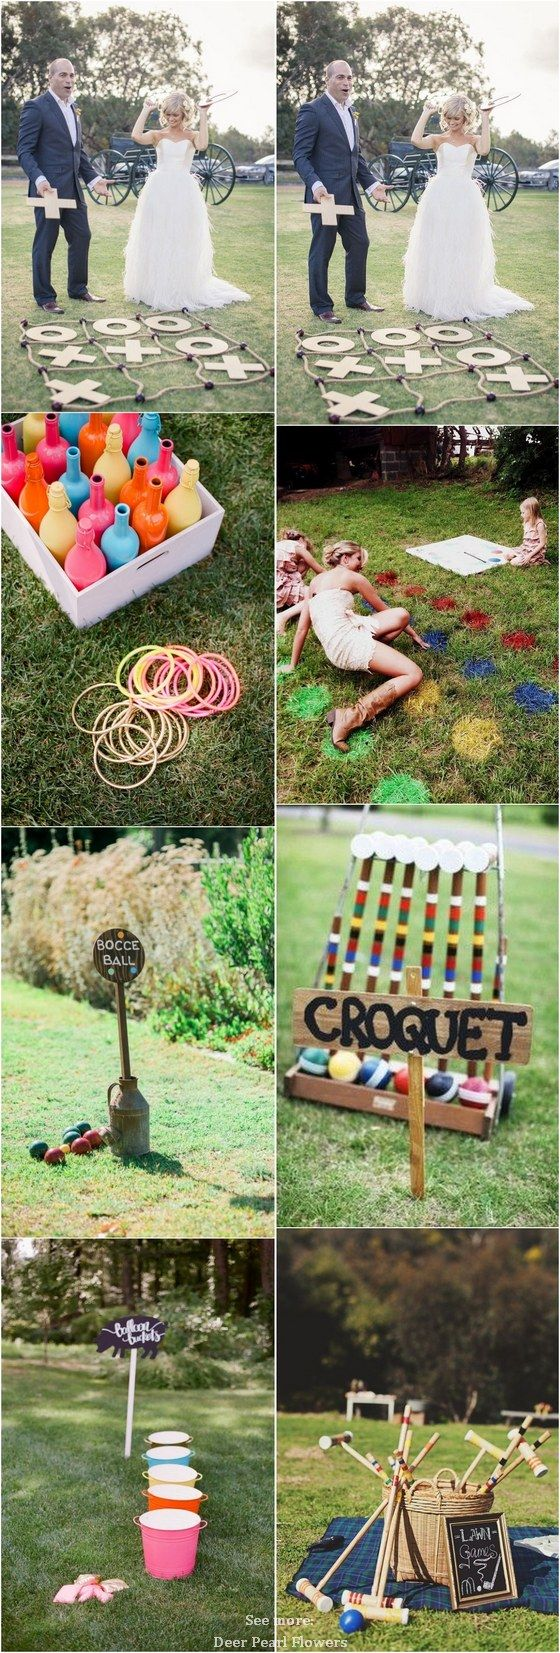 outdoor wedding reception lawn game ideas http www